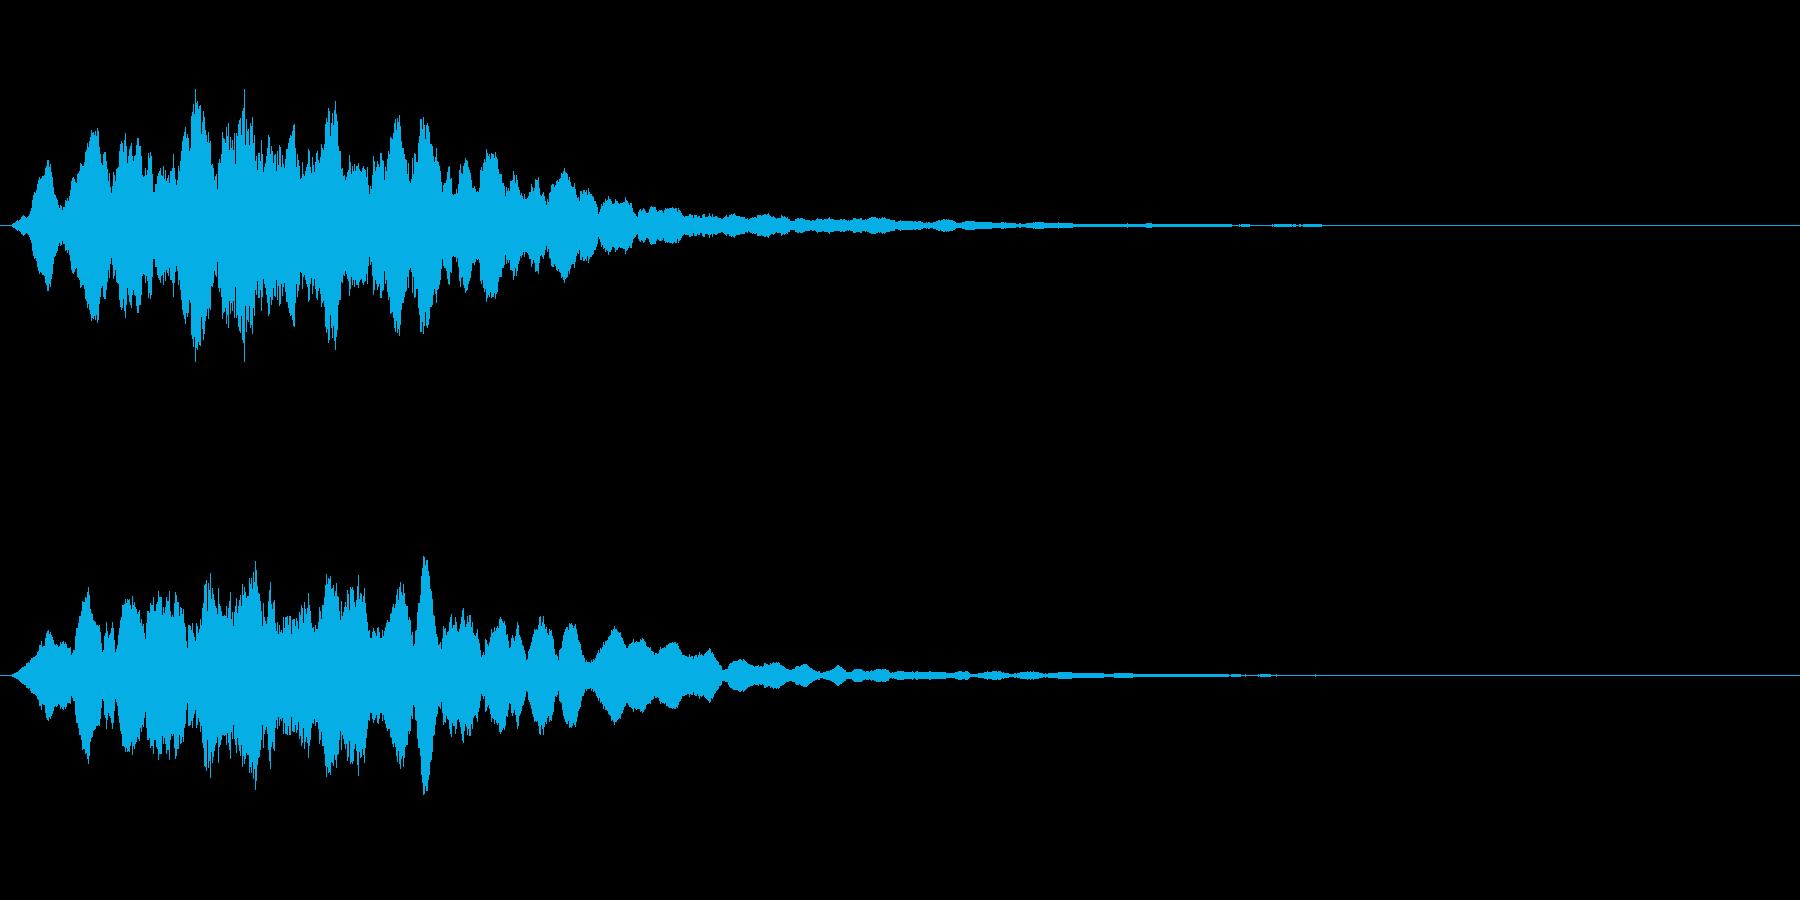 RPGにおける回復魔法の効果音。の再生済みの波形